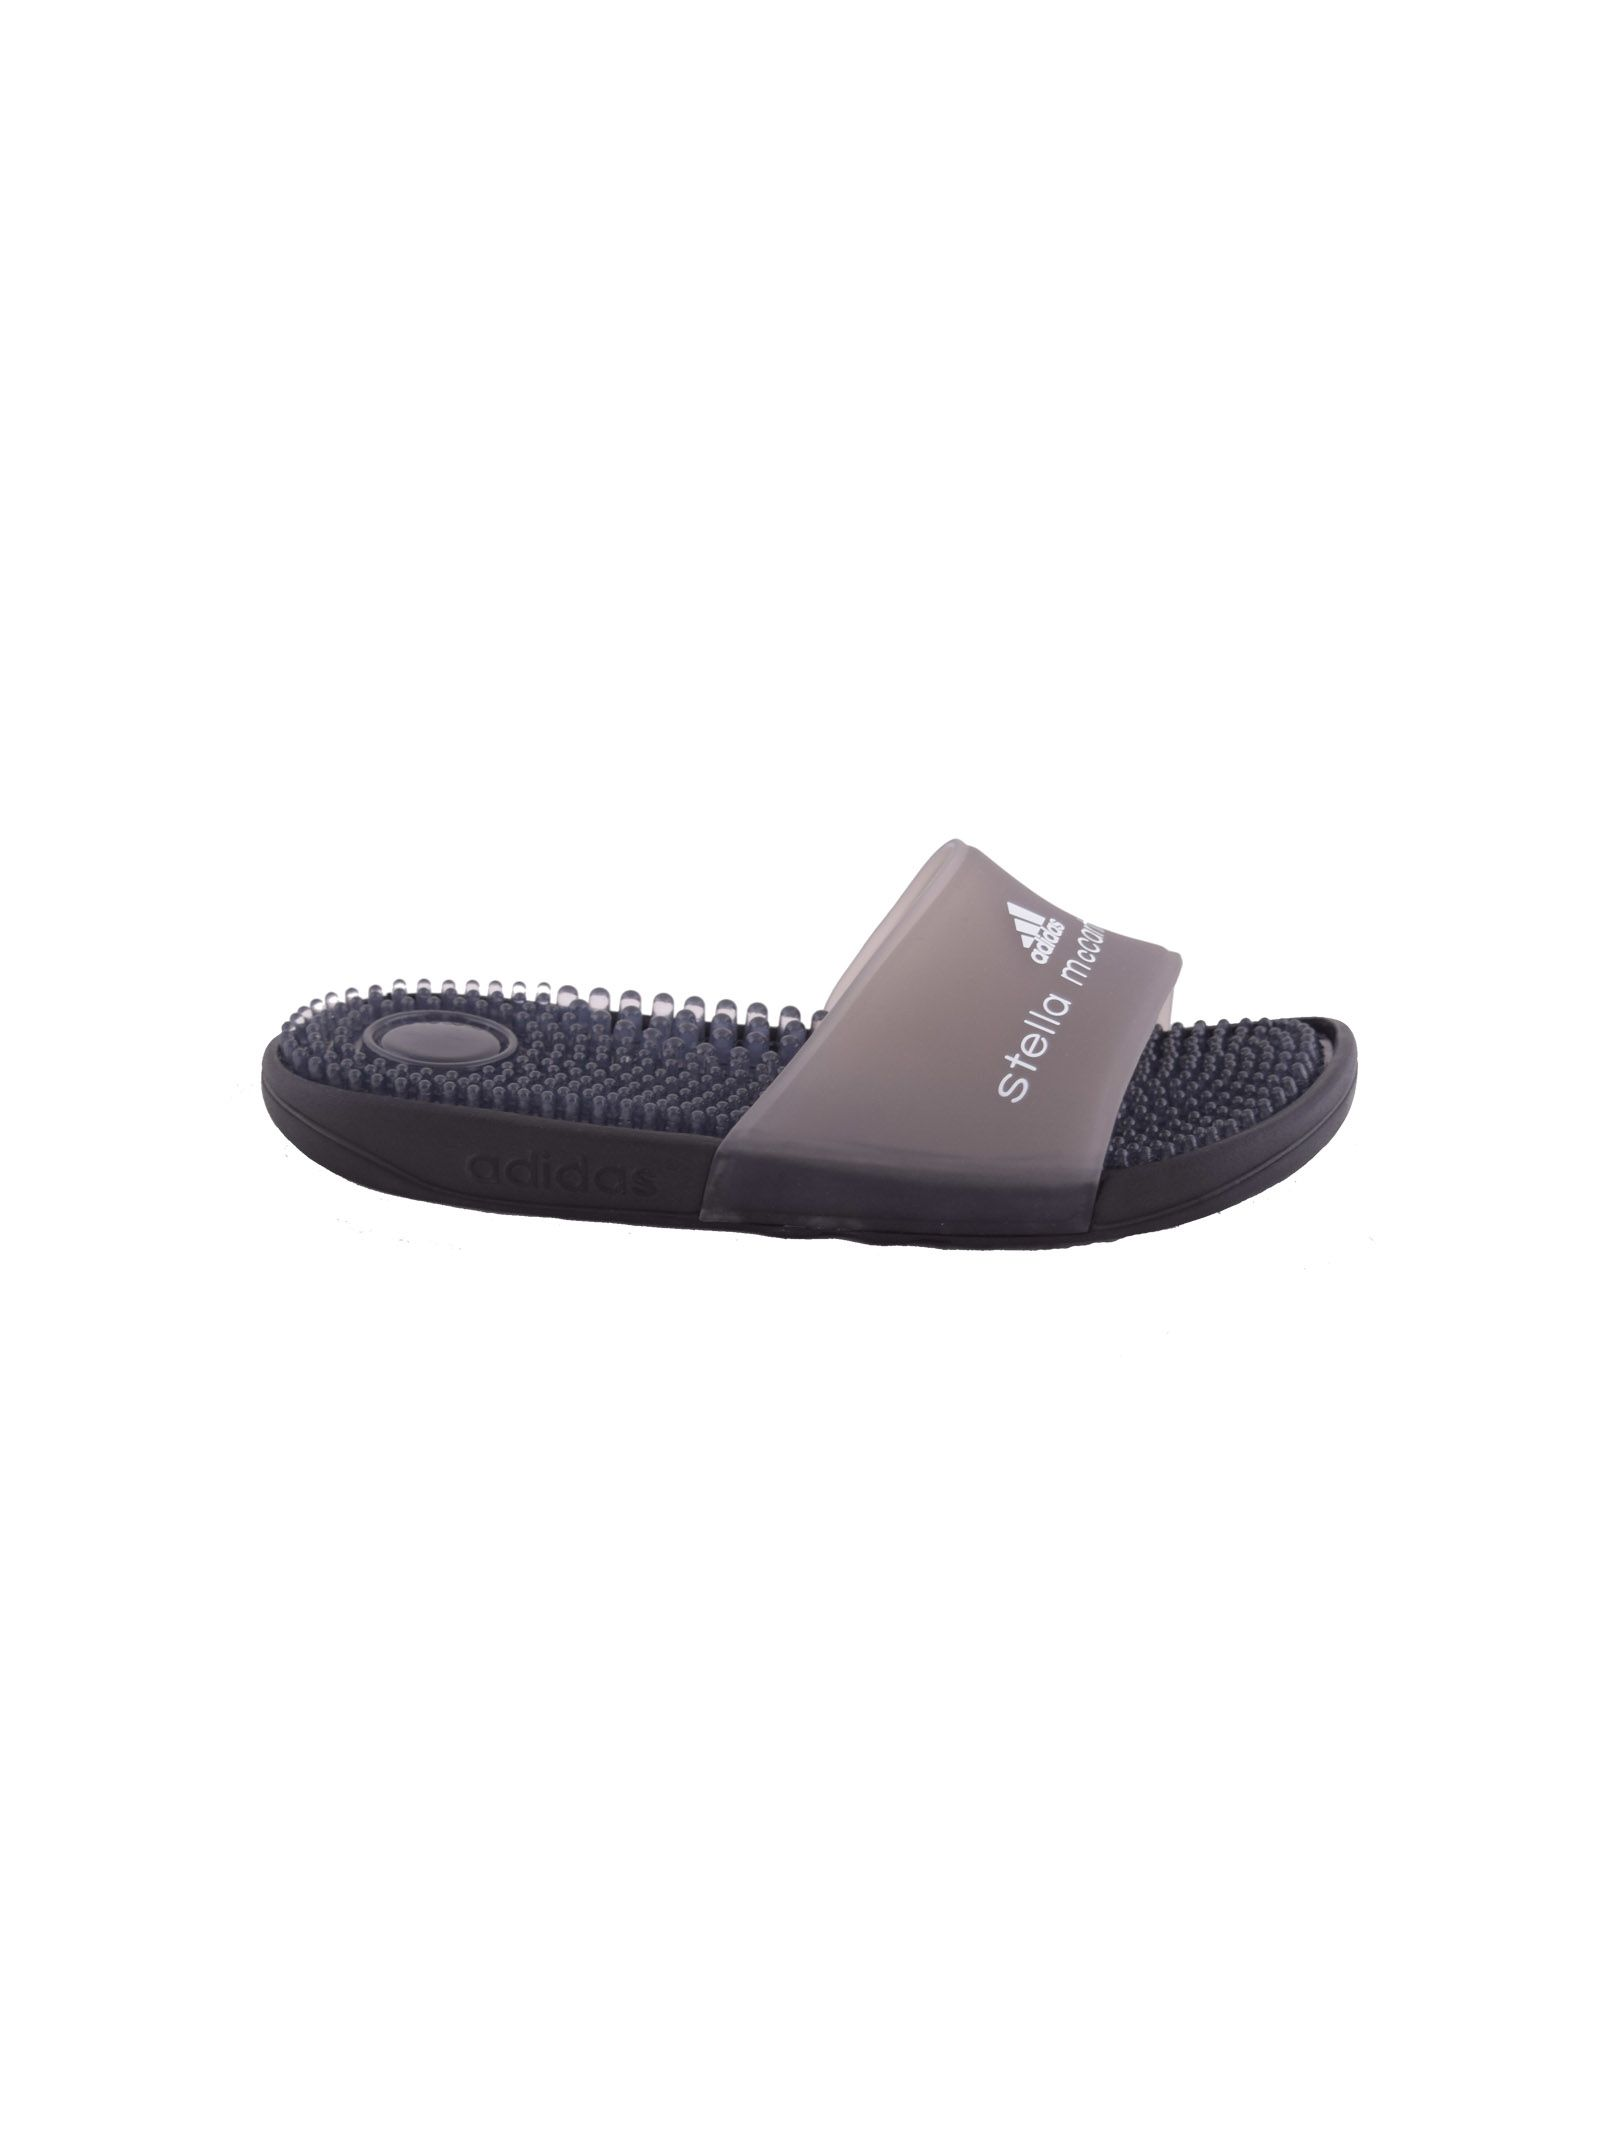 Adidas By Stella Mccartney Massage Nubs On Footbed Sliders